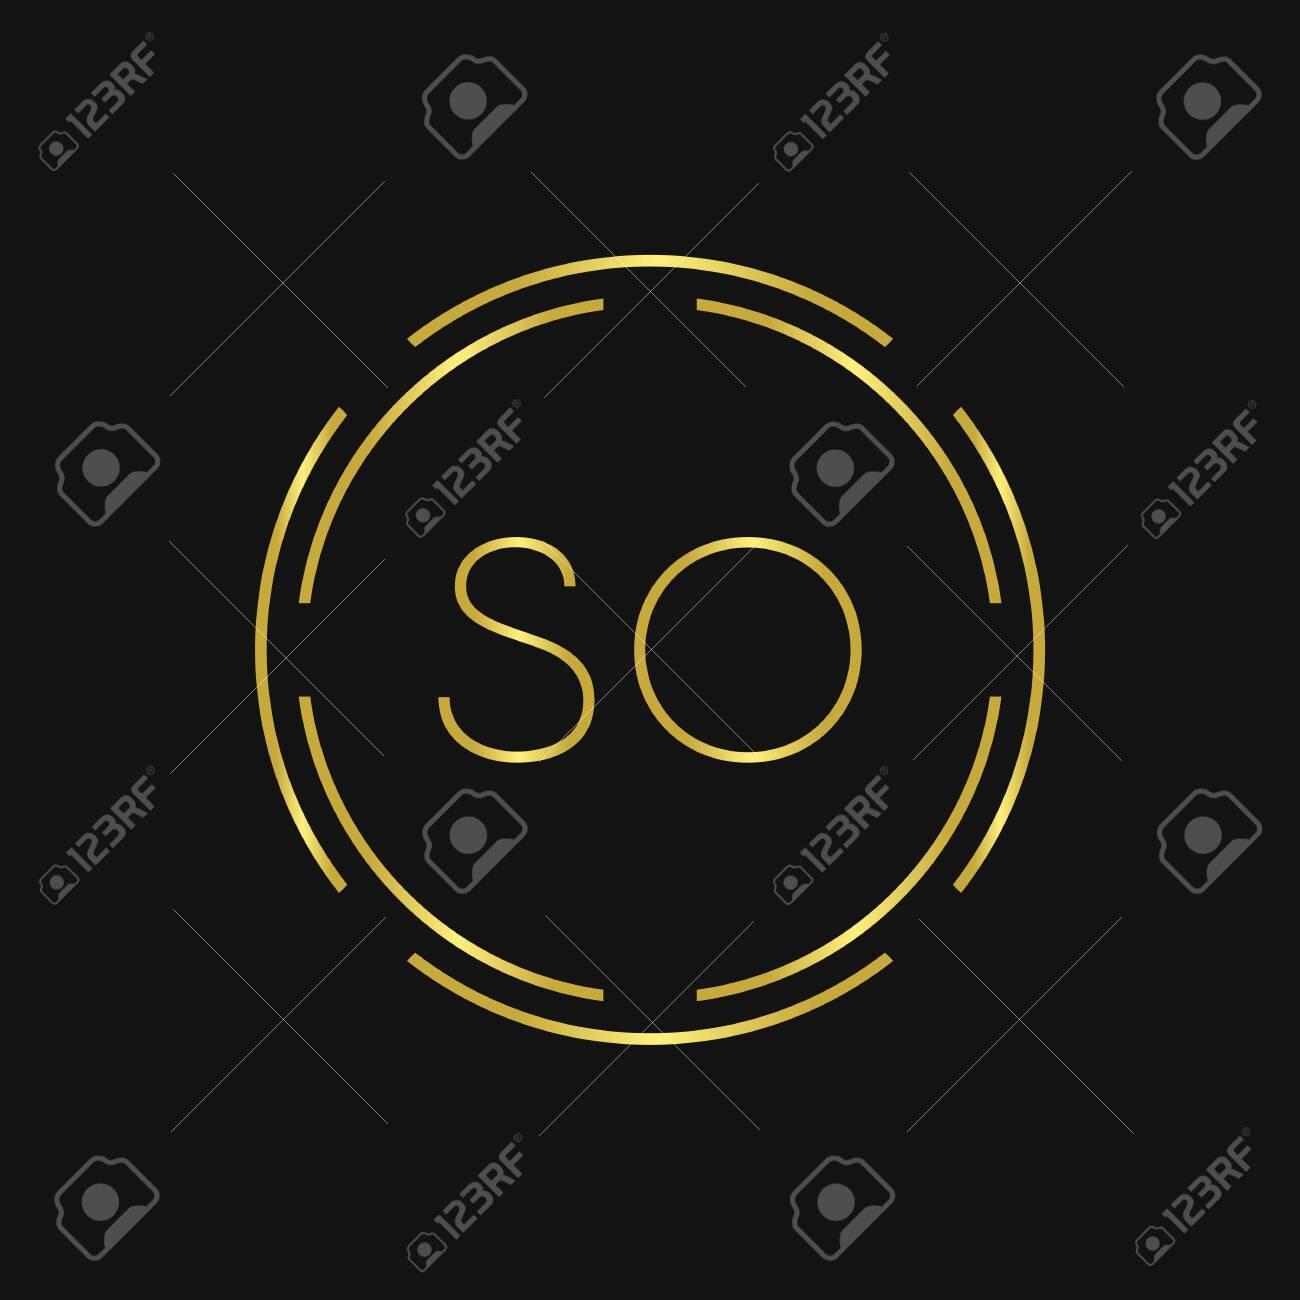 Initial SO Logo Design Creative Typography Vector Template. Digital Abstract Letter SO Logo Vector Illustration - 146258218